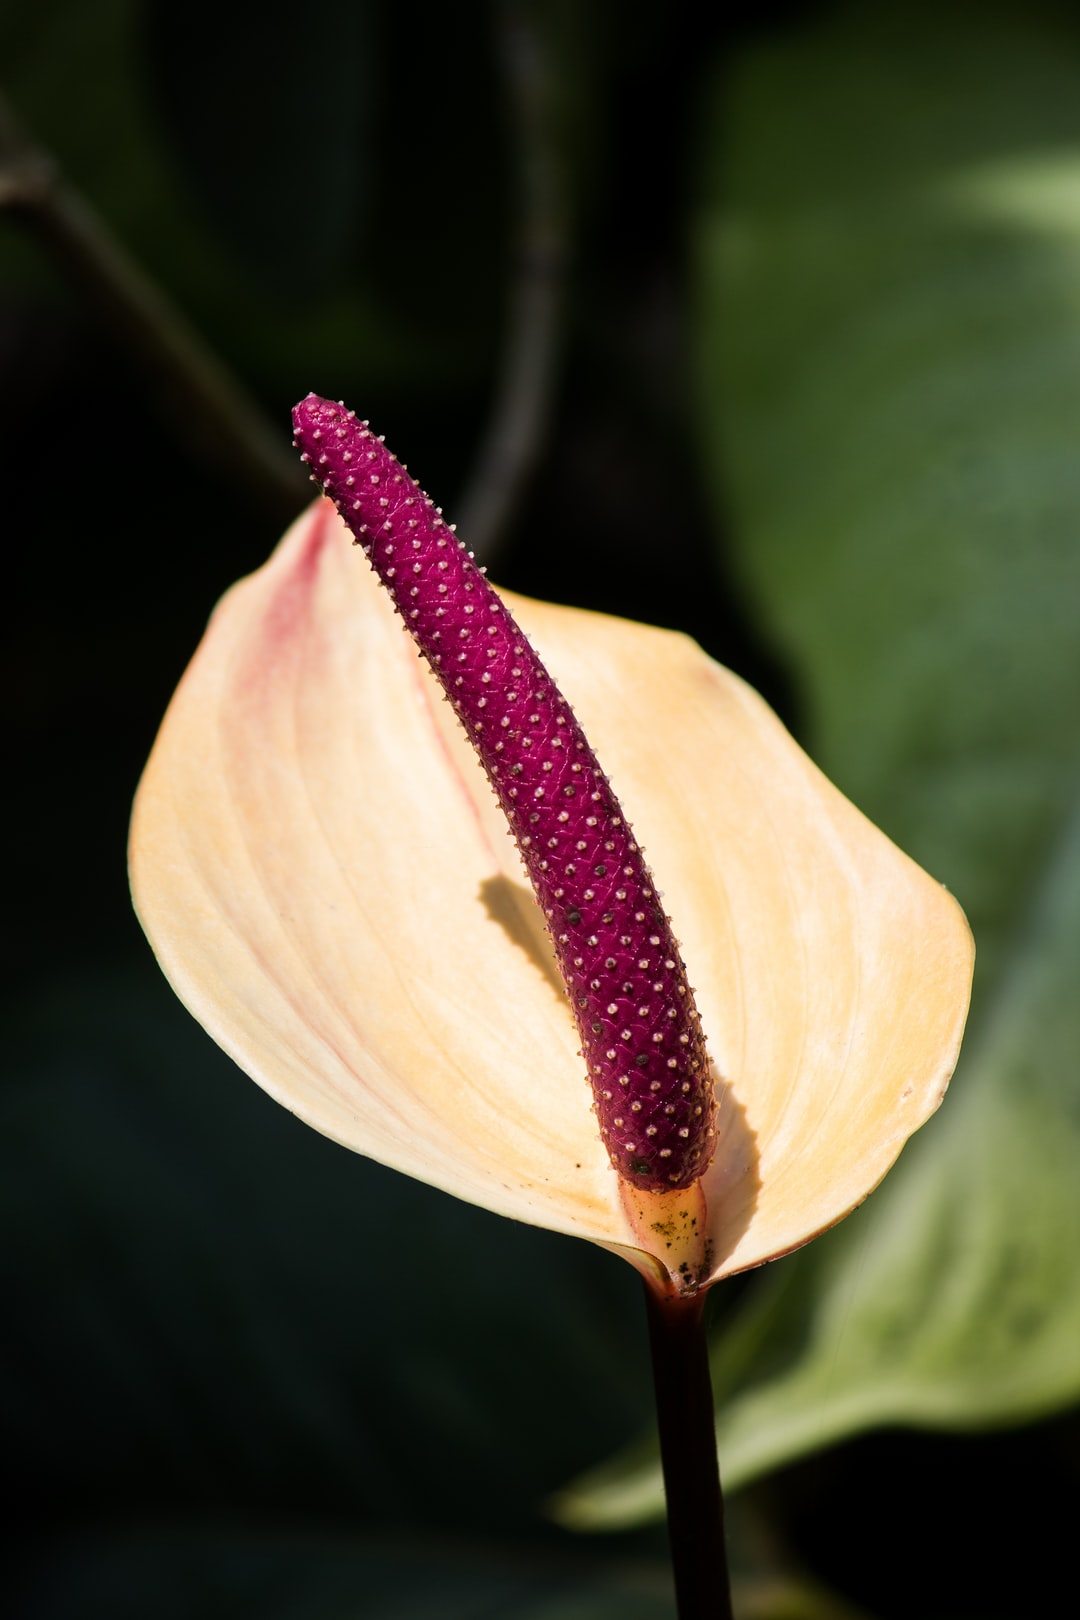 Fading anthurium blossom